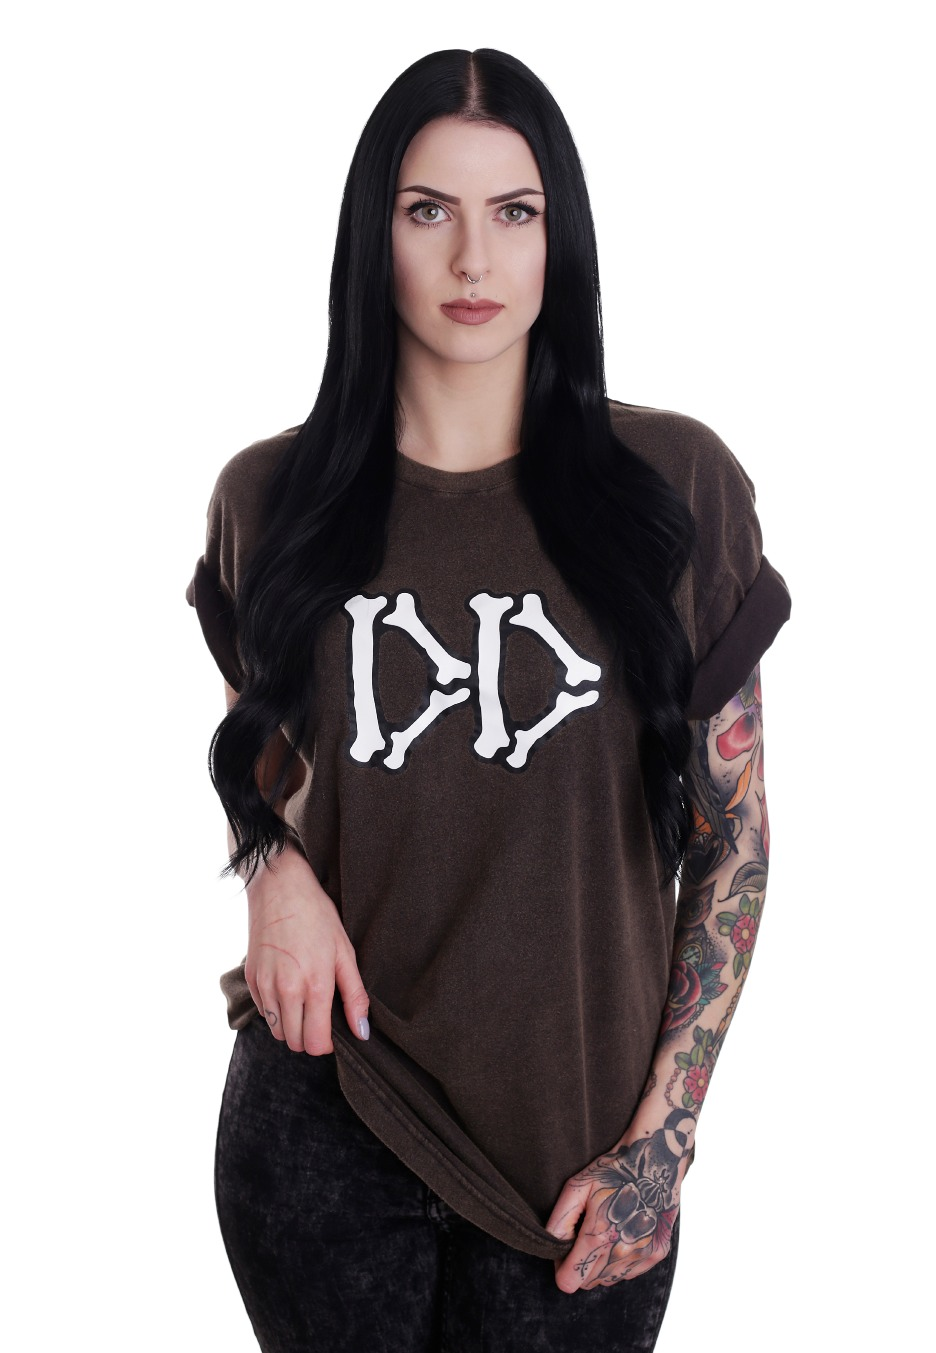 Black t shirt girl - Black T Shirt Girl 54